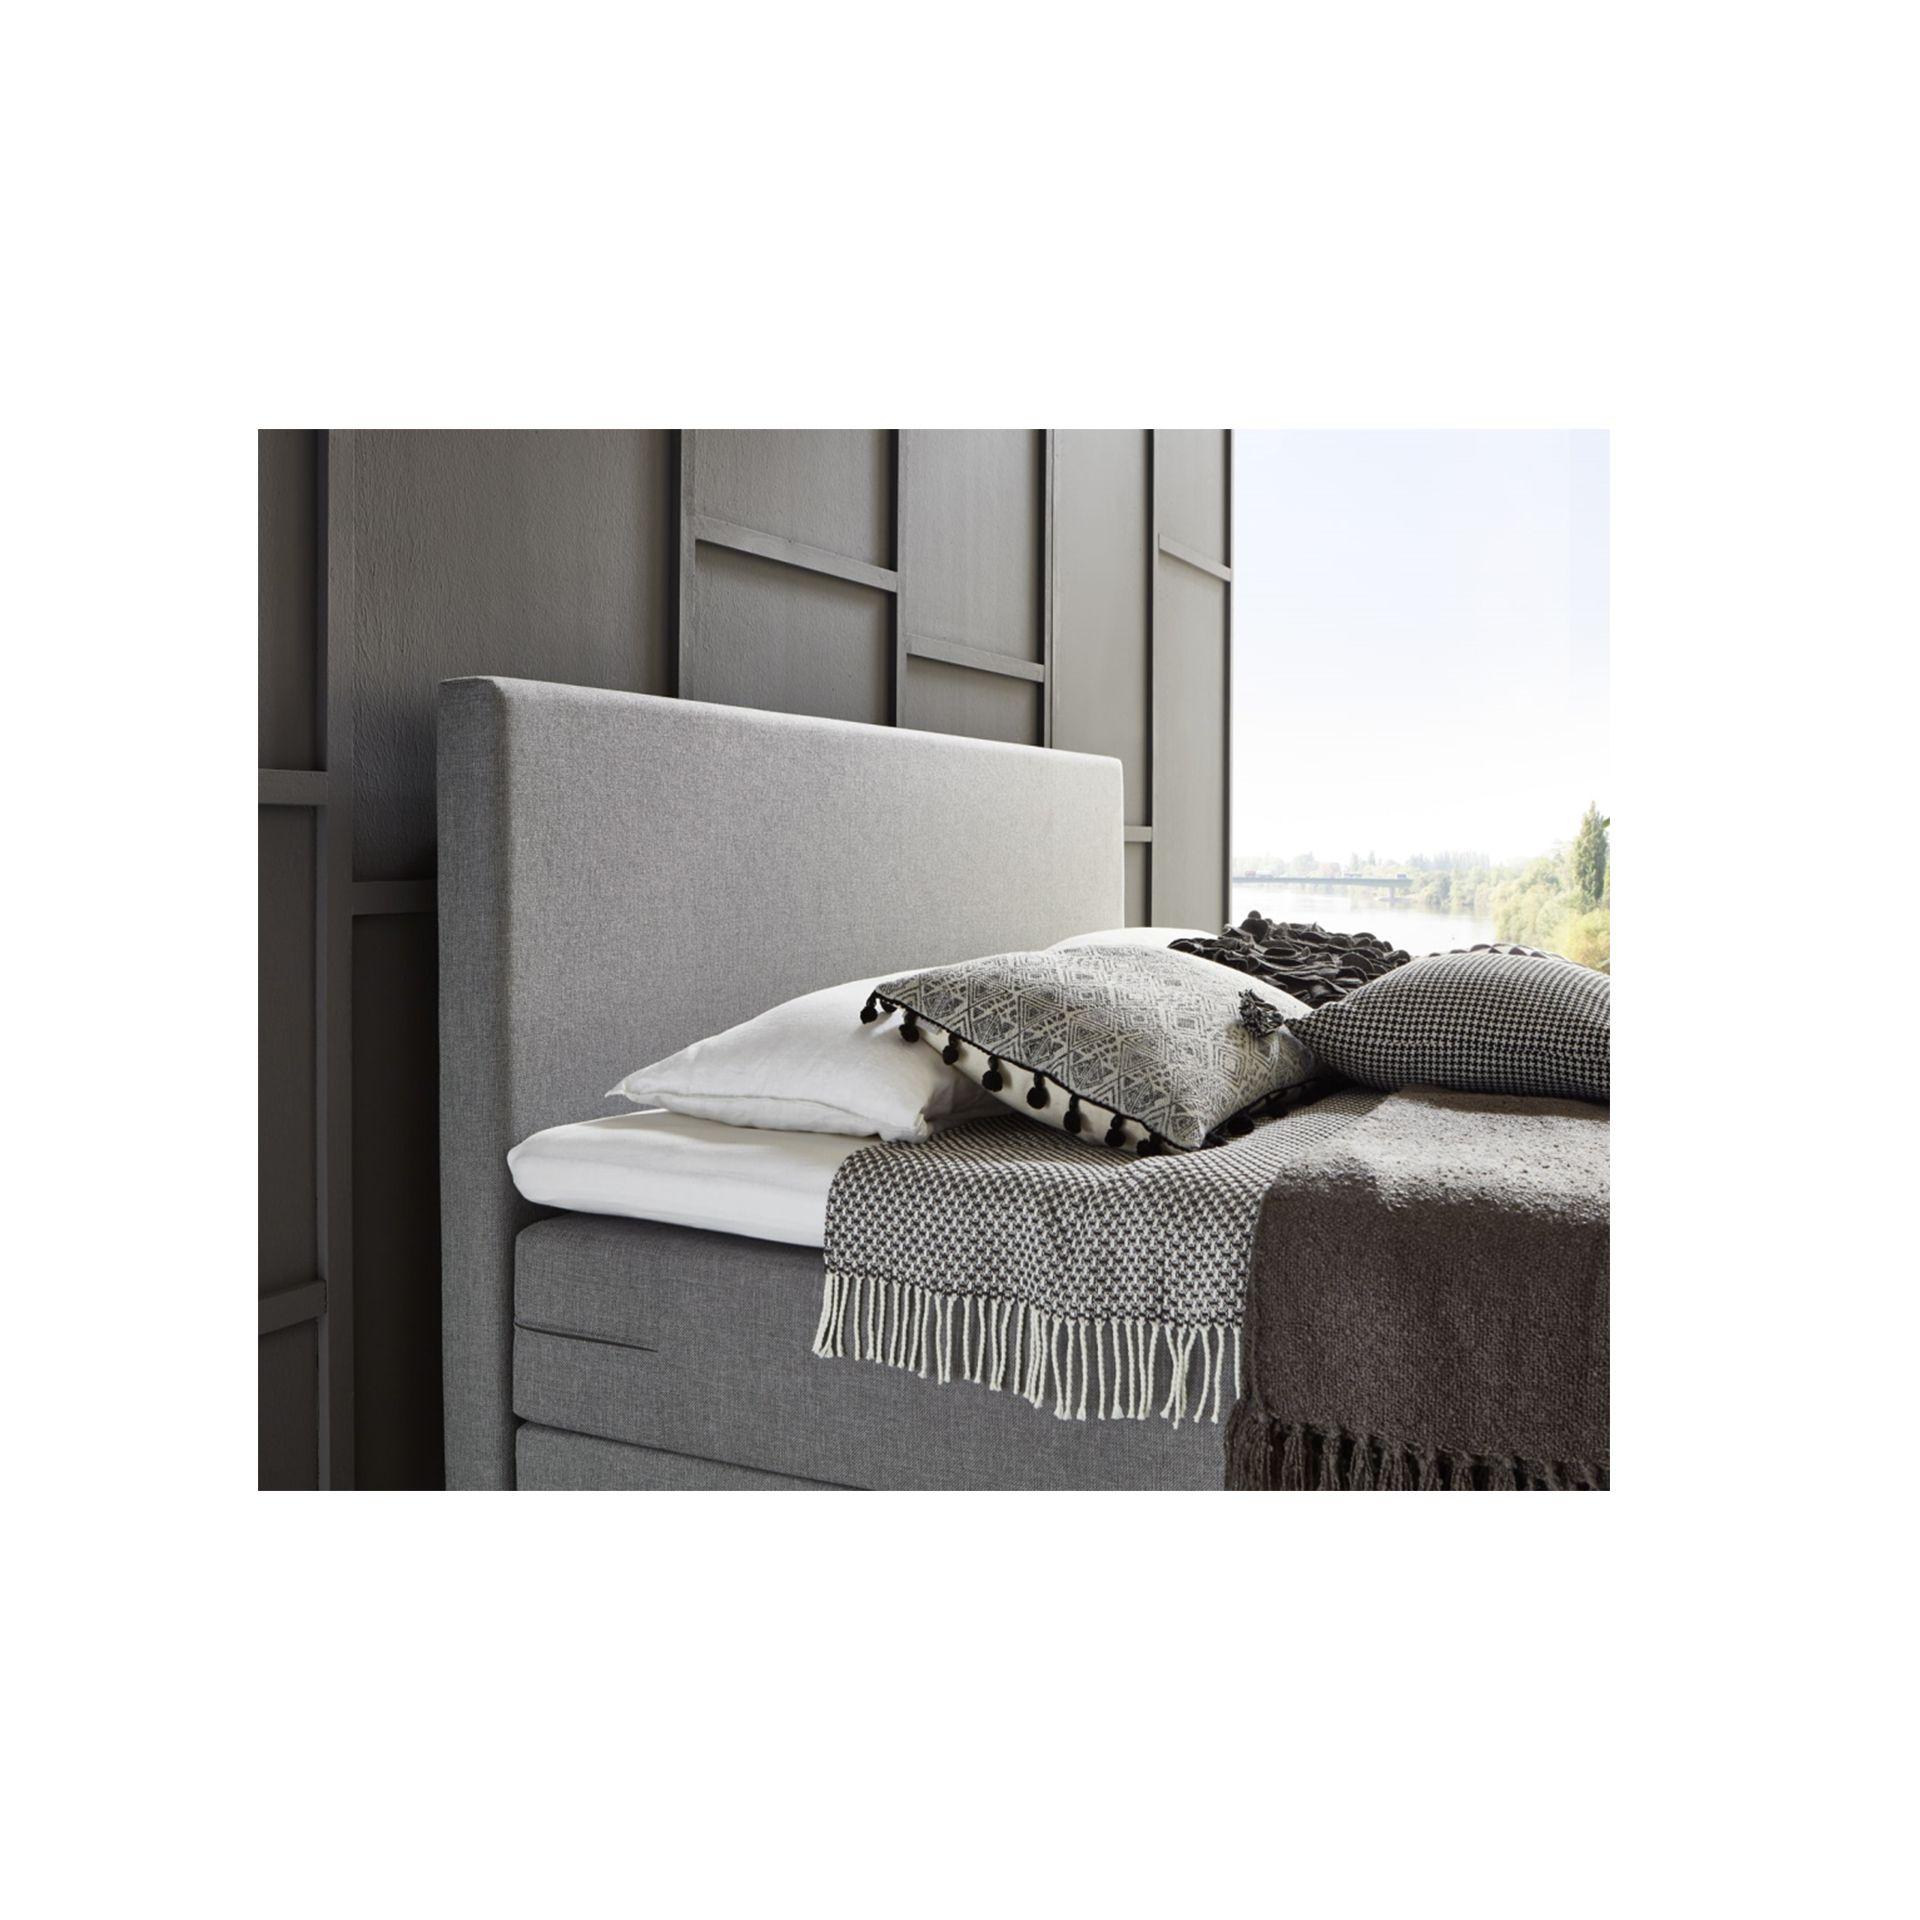 Dreambox Style Boxspring - V450